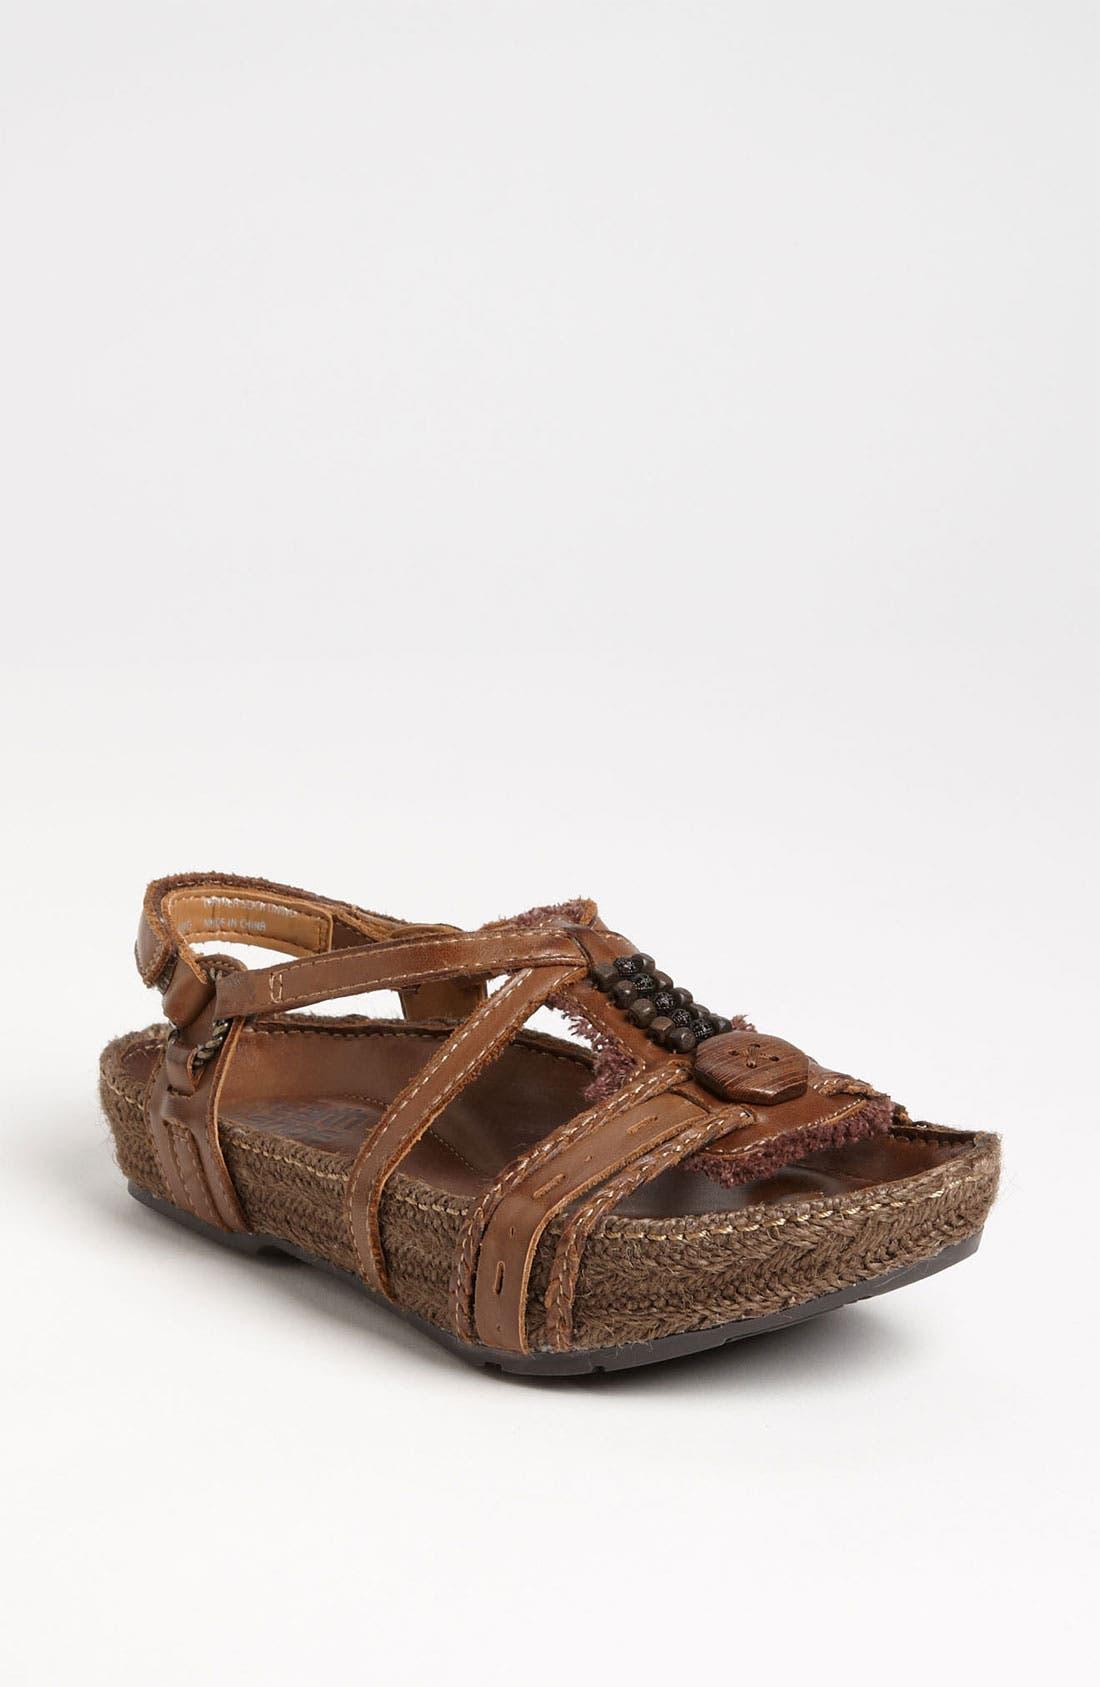 Alternate Image 1 Selected - Kalso Earth® 'Embrace' Sandal